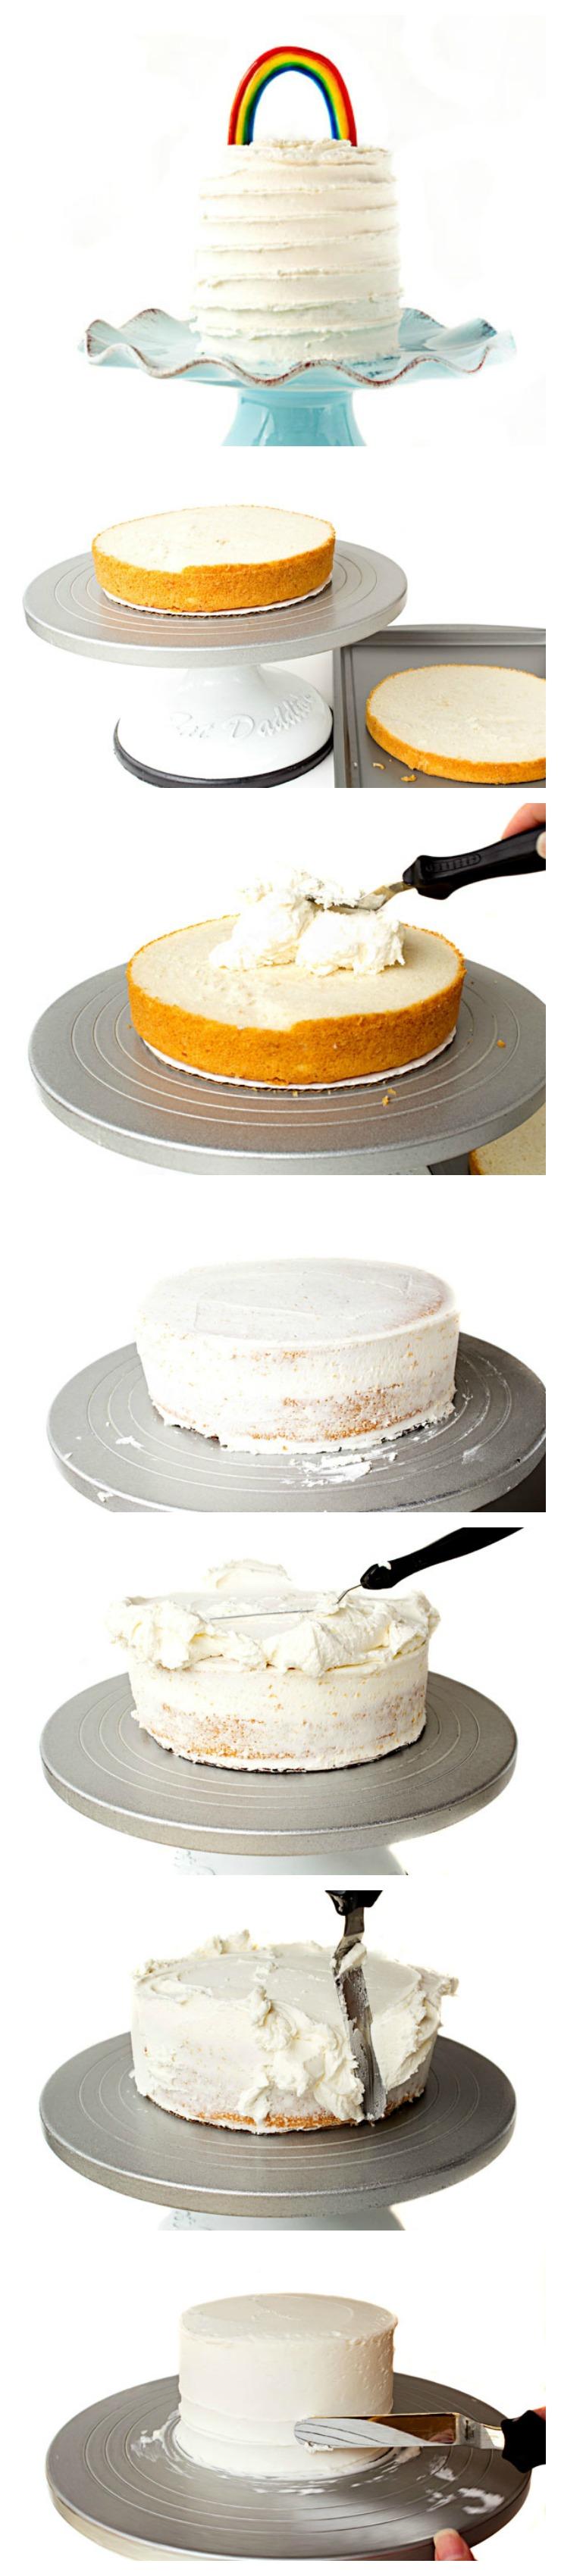 Rainbow Cake www.thebearfootbaker.com